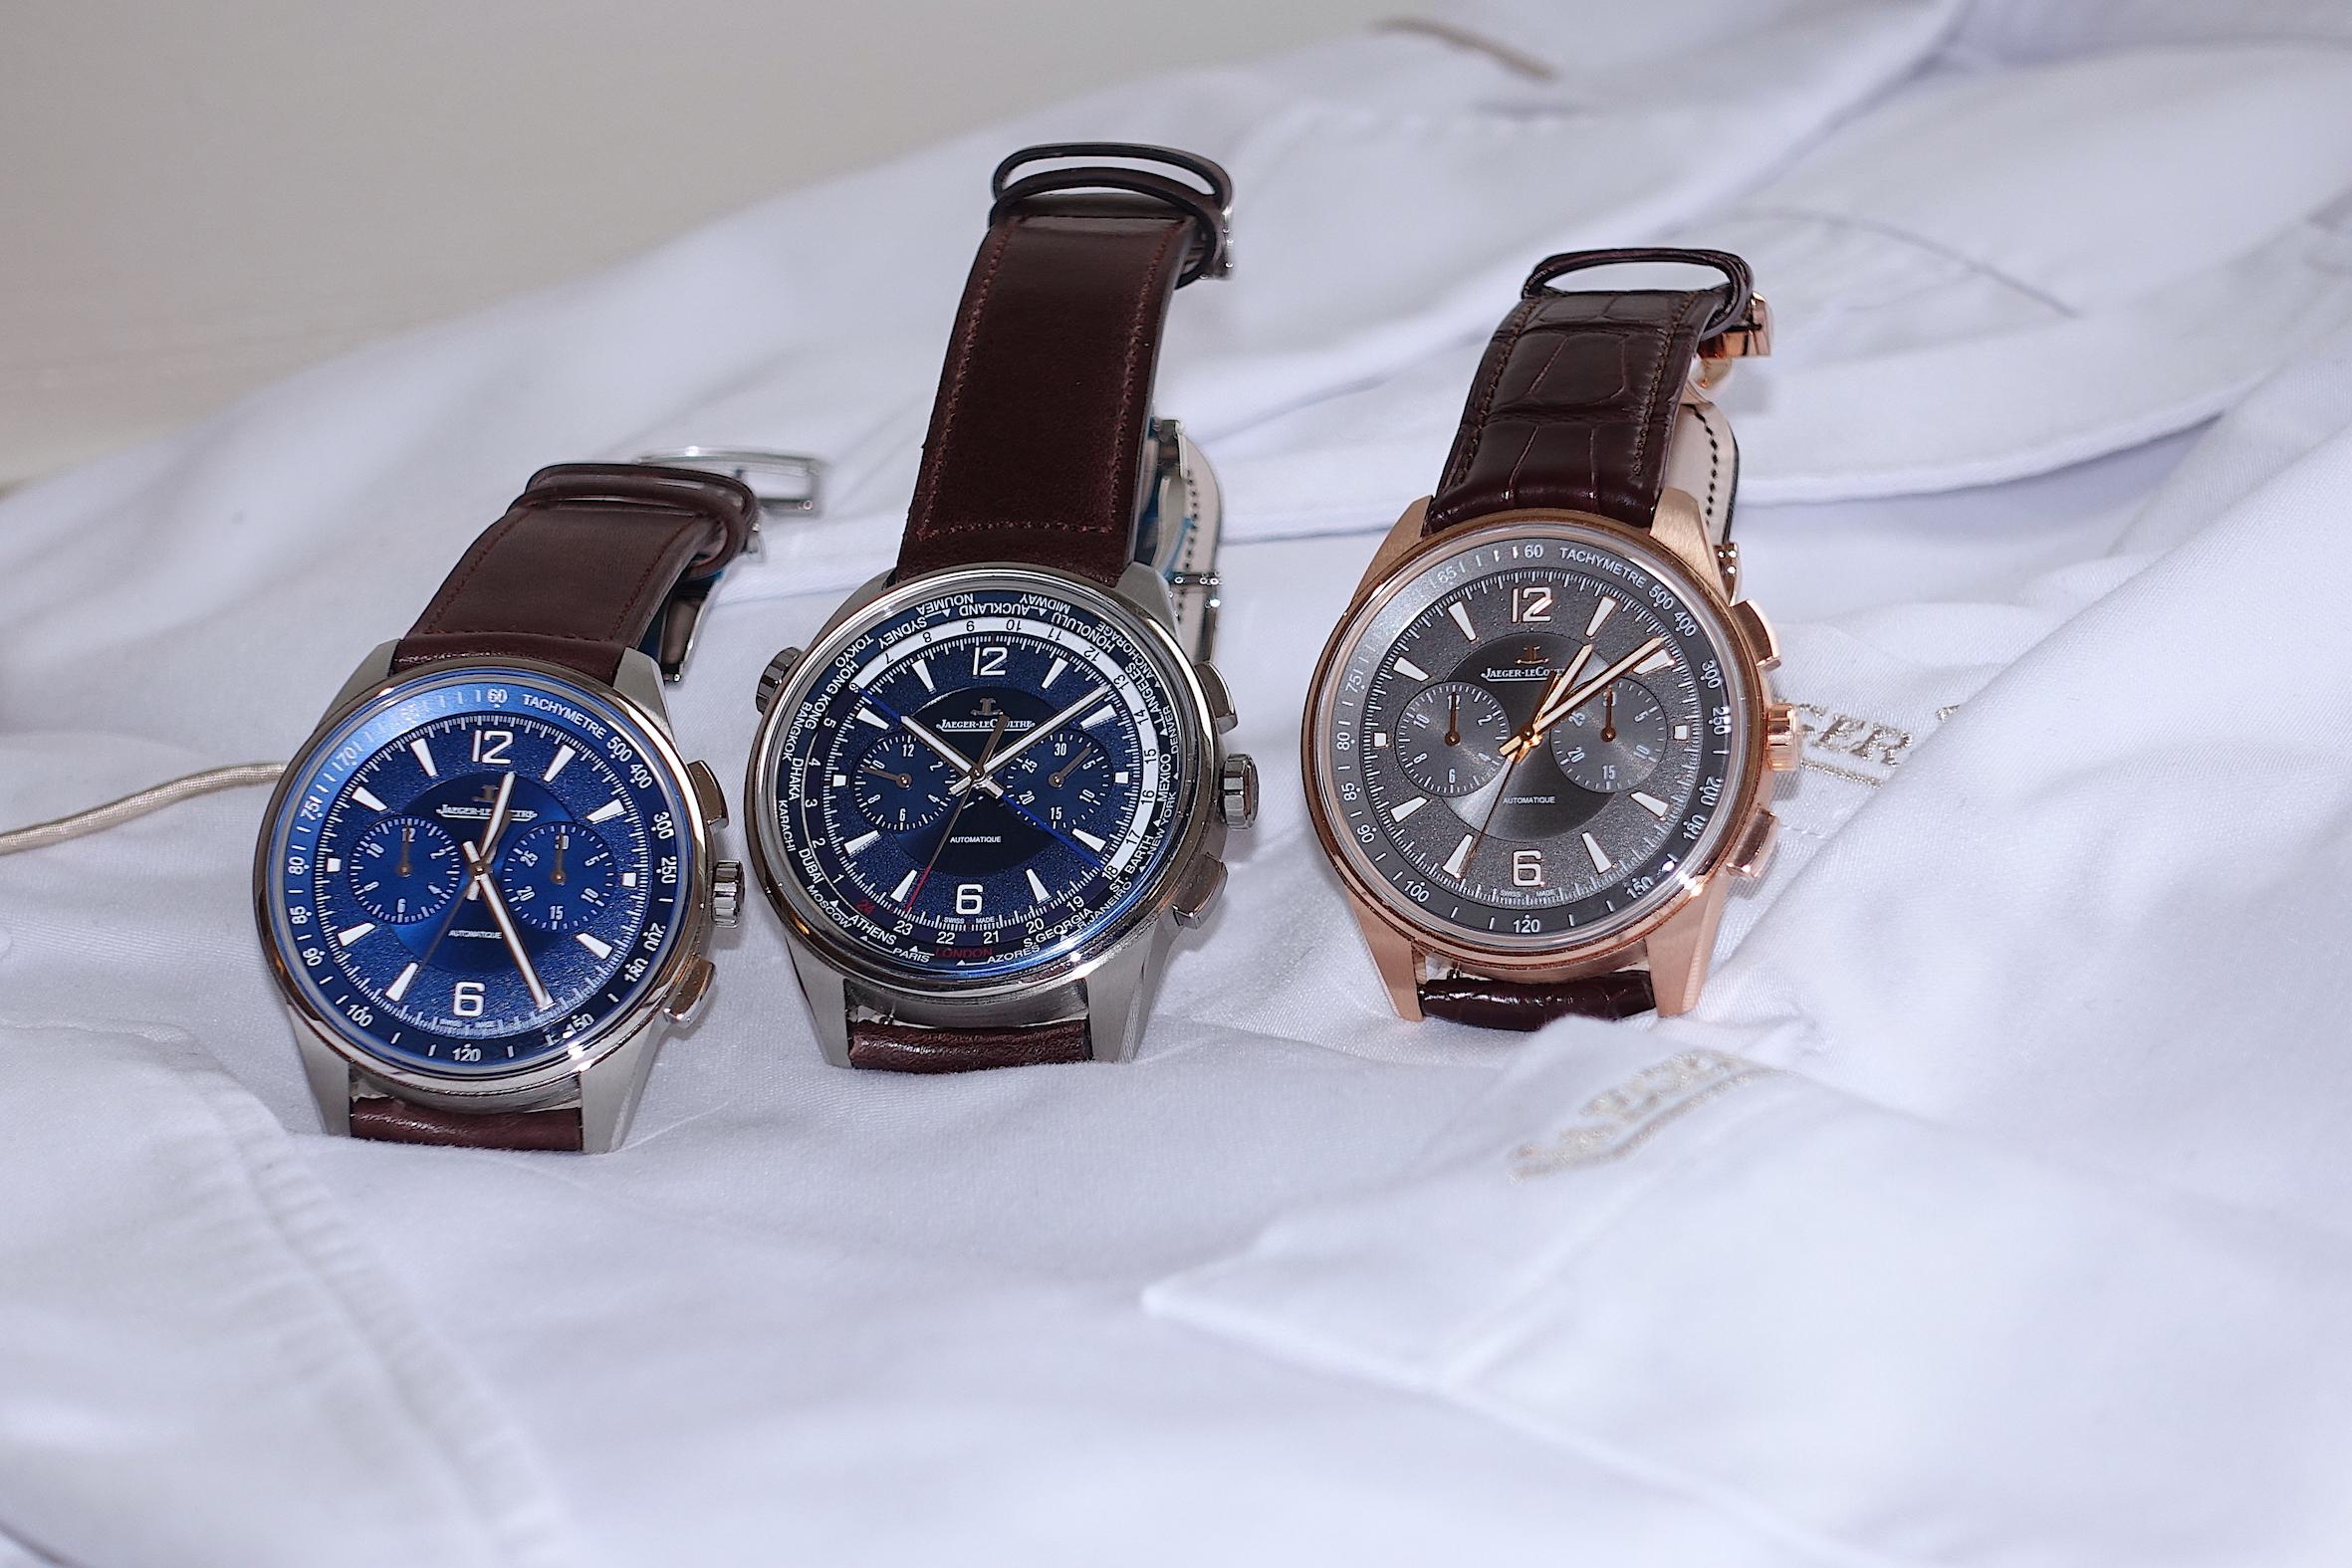 Jaeger-LeCoultre 'Polaris Chronograph' and Jaeger-LeCoultre 'Polaris Chronograph World Time'